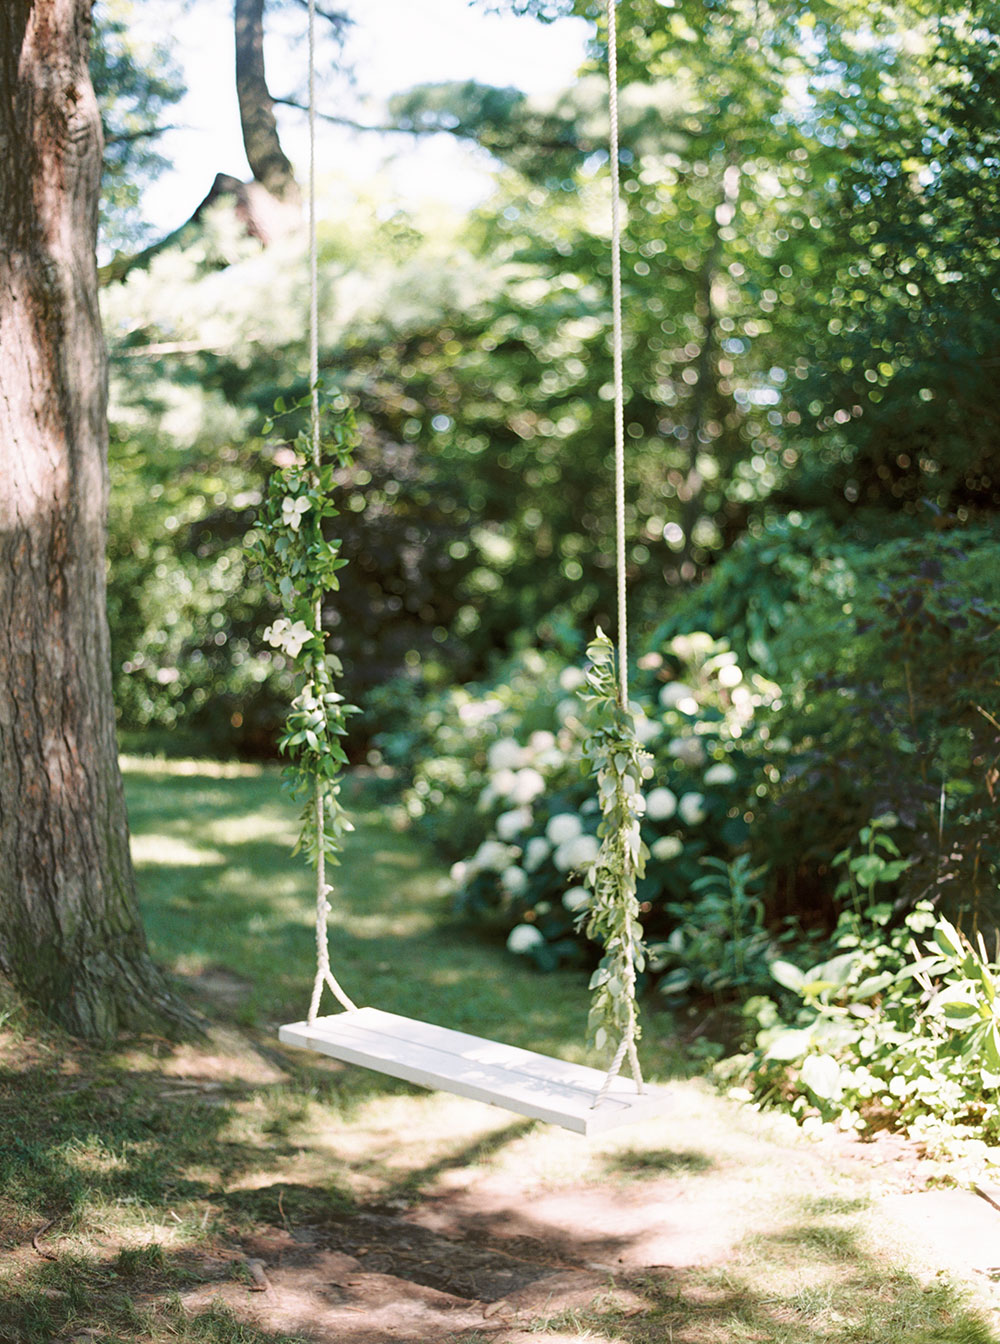 kurtz-orchards-wedding-gracewood-estate-niagara-on-the-lake-photo-by-katie-nicolle-photography-0016.JPG